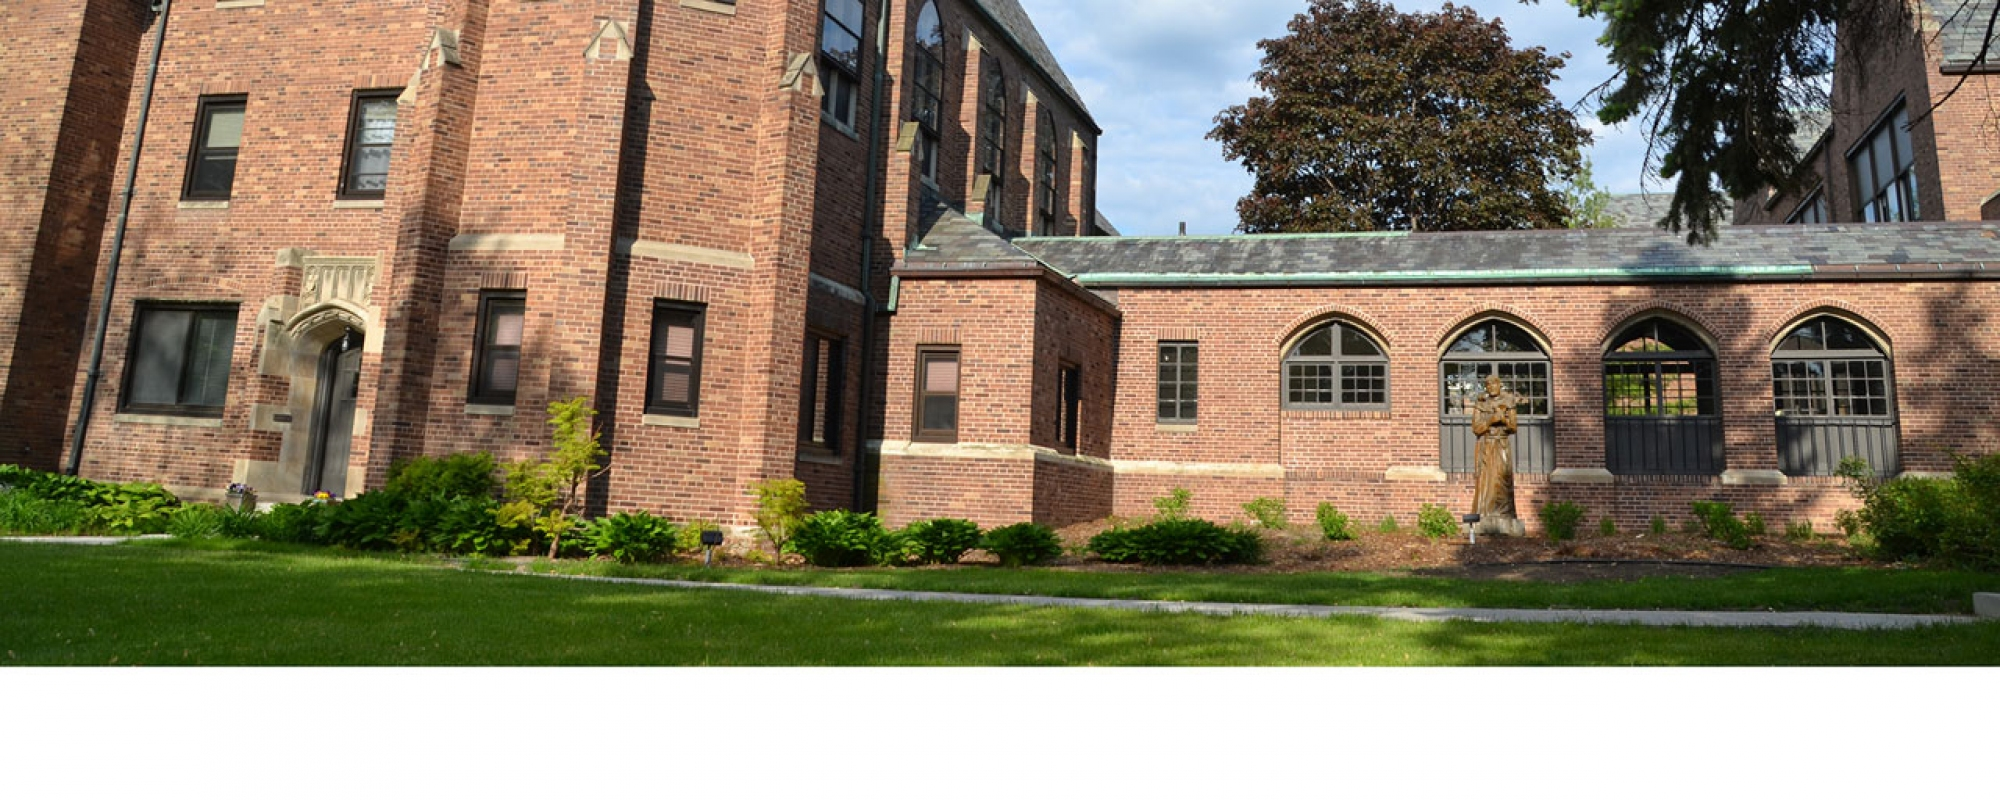 Twin Cities Boarding School in Minnesota - Amerigo Education